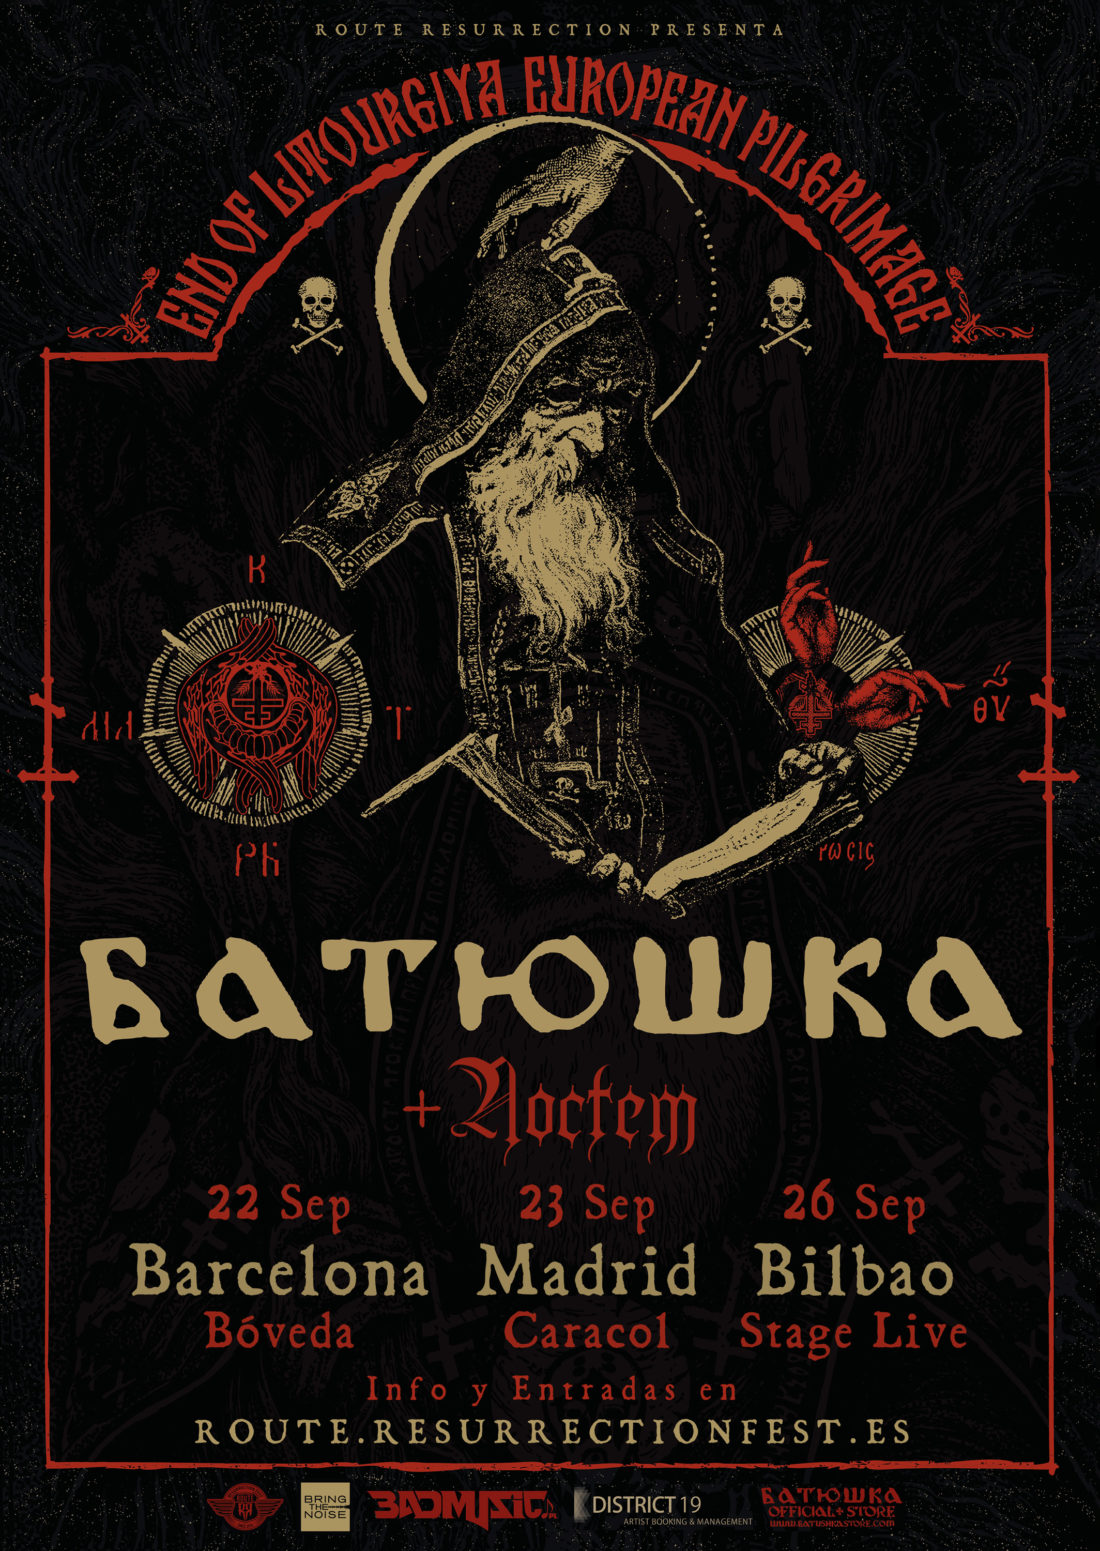 ADORANDO EL BLACK METAL A LOS 40 - Página 3 Route-Resurrection-2018-Batushka-Poster-Noctem-1100x1551